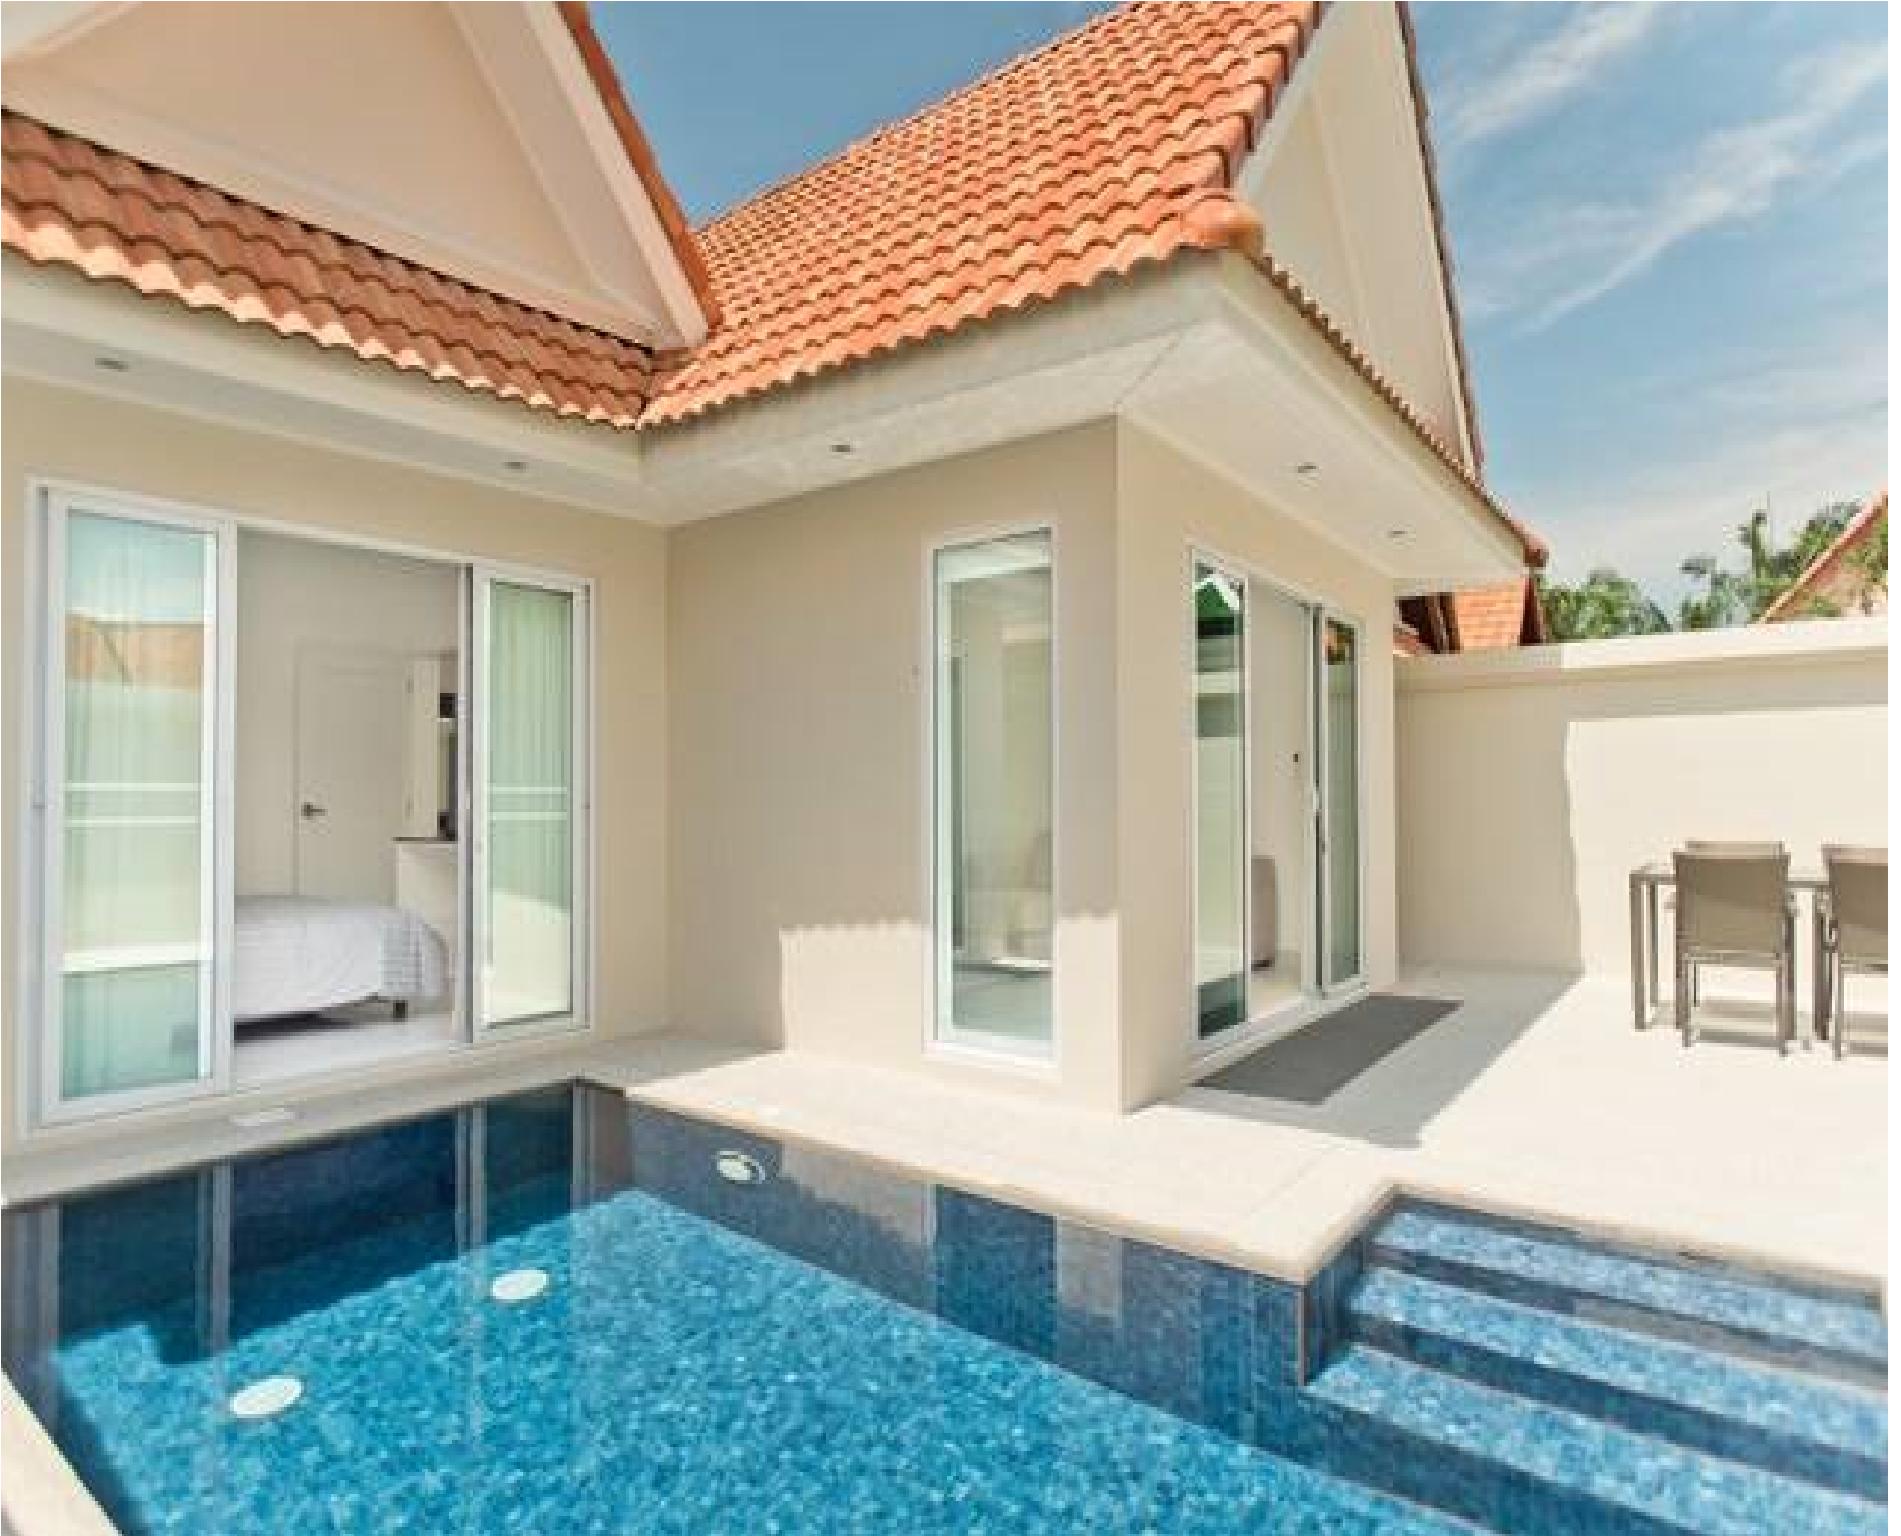 View Talay Villas - Luxury 2 Bed with Private Pool วิลลา 2 ห้องนอน 1 ห้องน้ำส่วนตัว ขนาด 160 ตร.ม. – หาดจอมเทียน